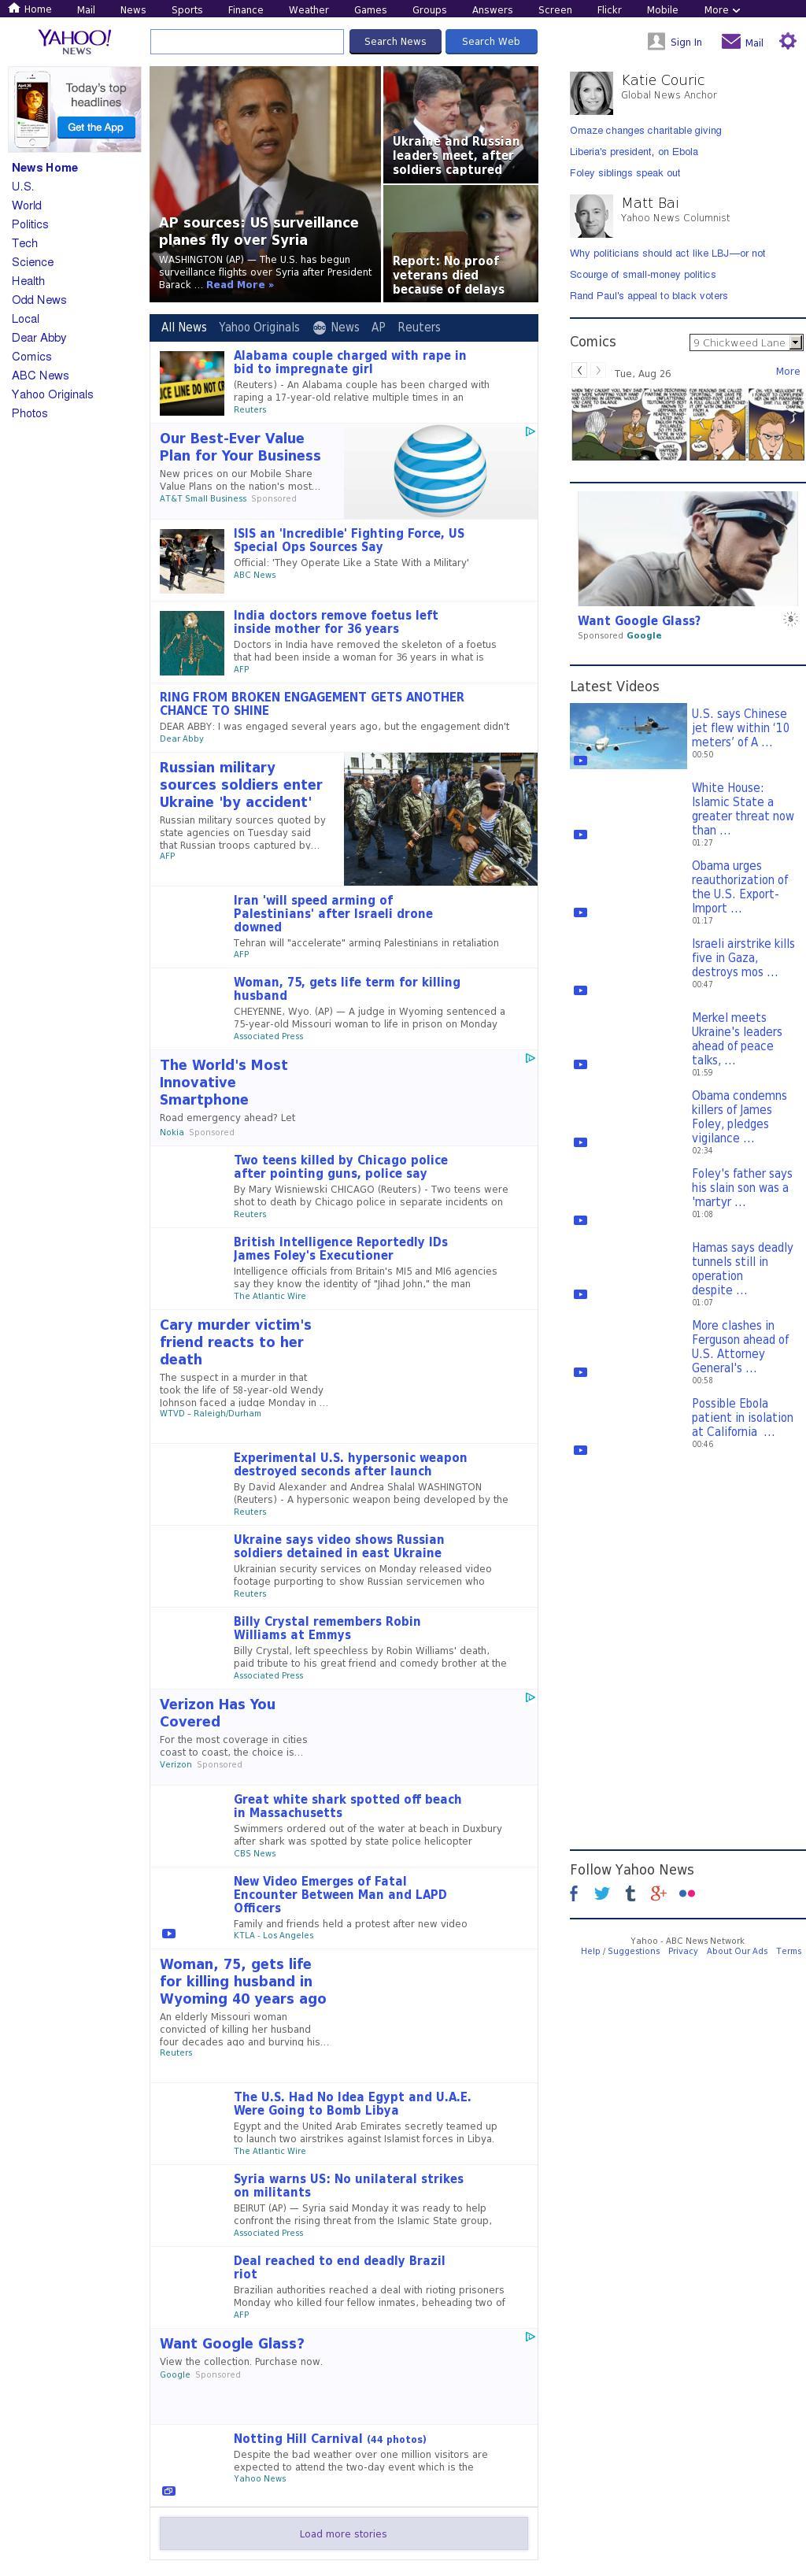 Yahoo! News at Tuesday Aug. 26, 2014, 10:19 a.m. UTC